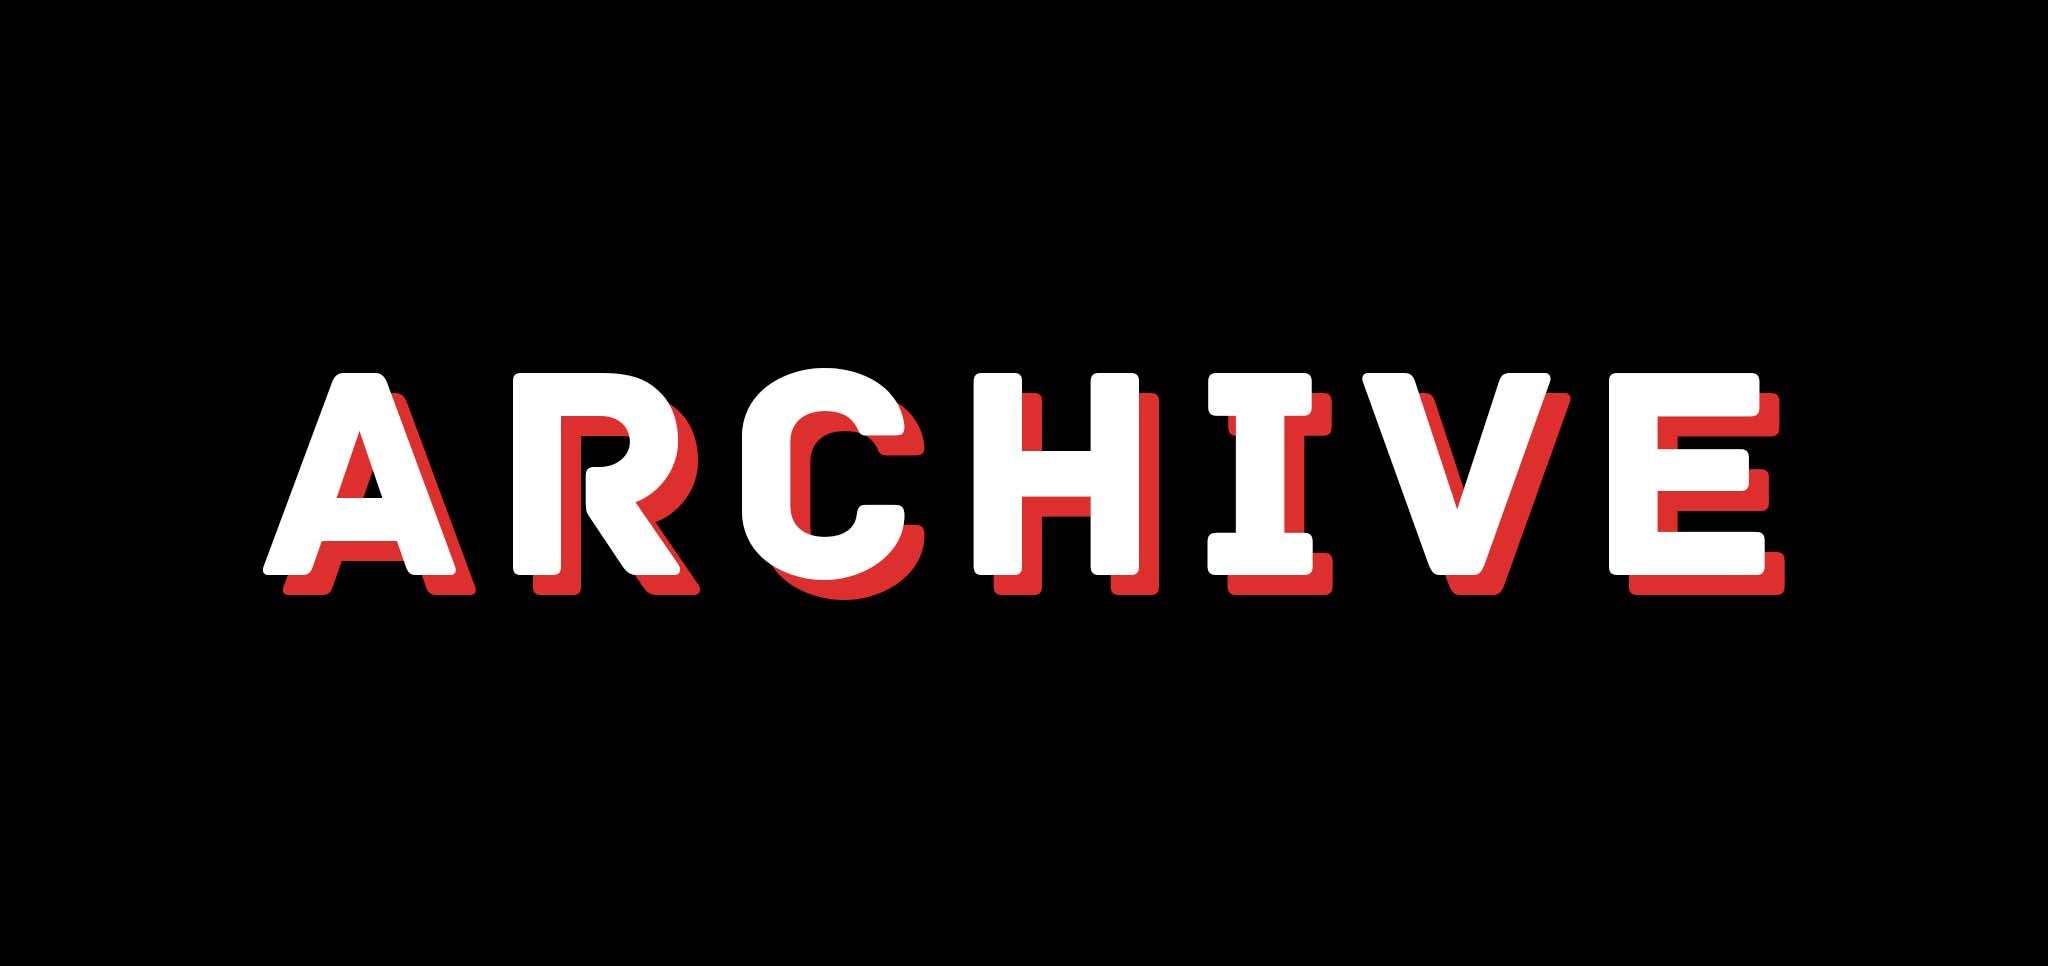 21 gratis stoere lettertypes - Archive